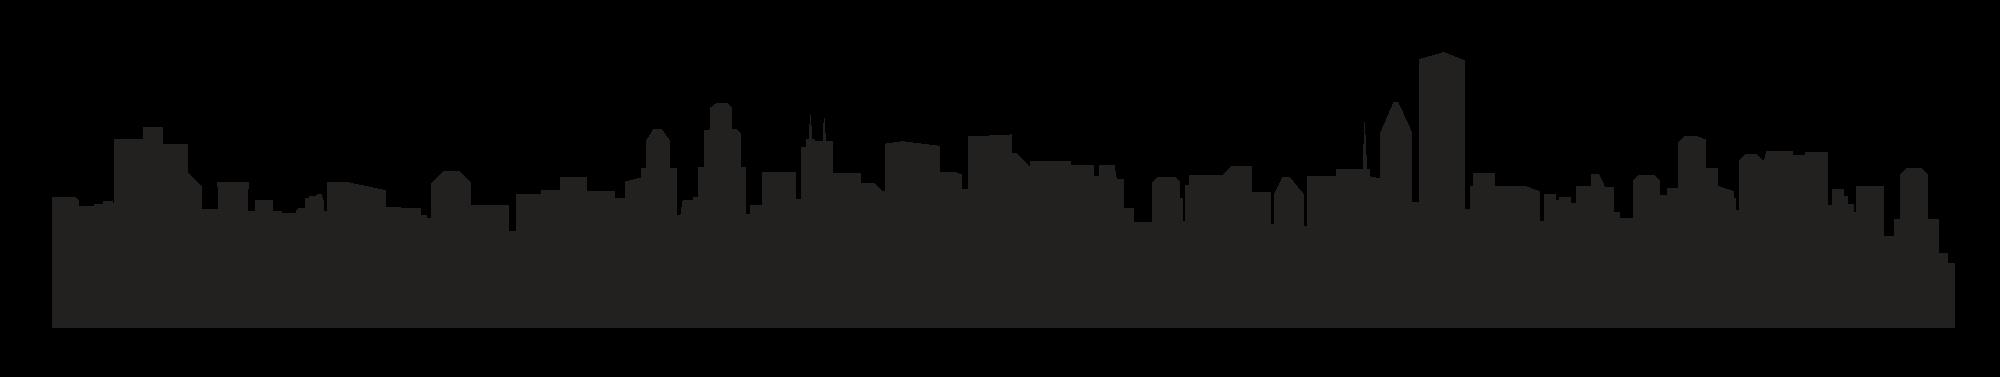 2000x377 Denver Skyline Clip Art